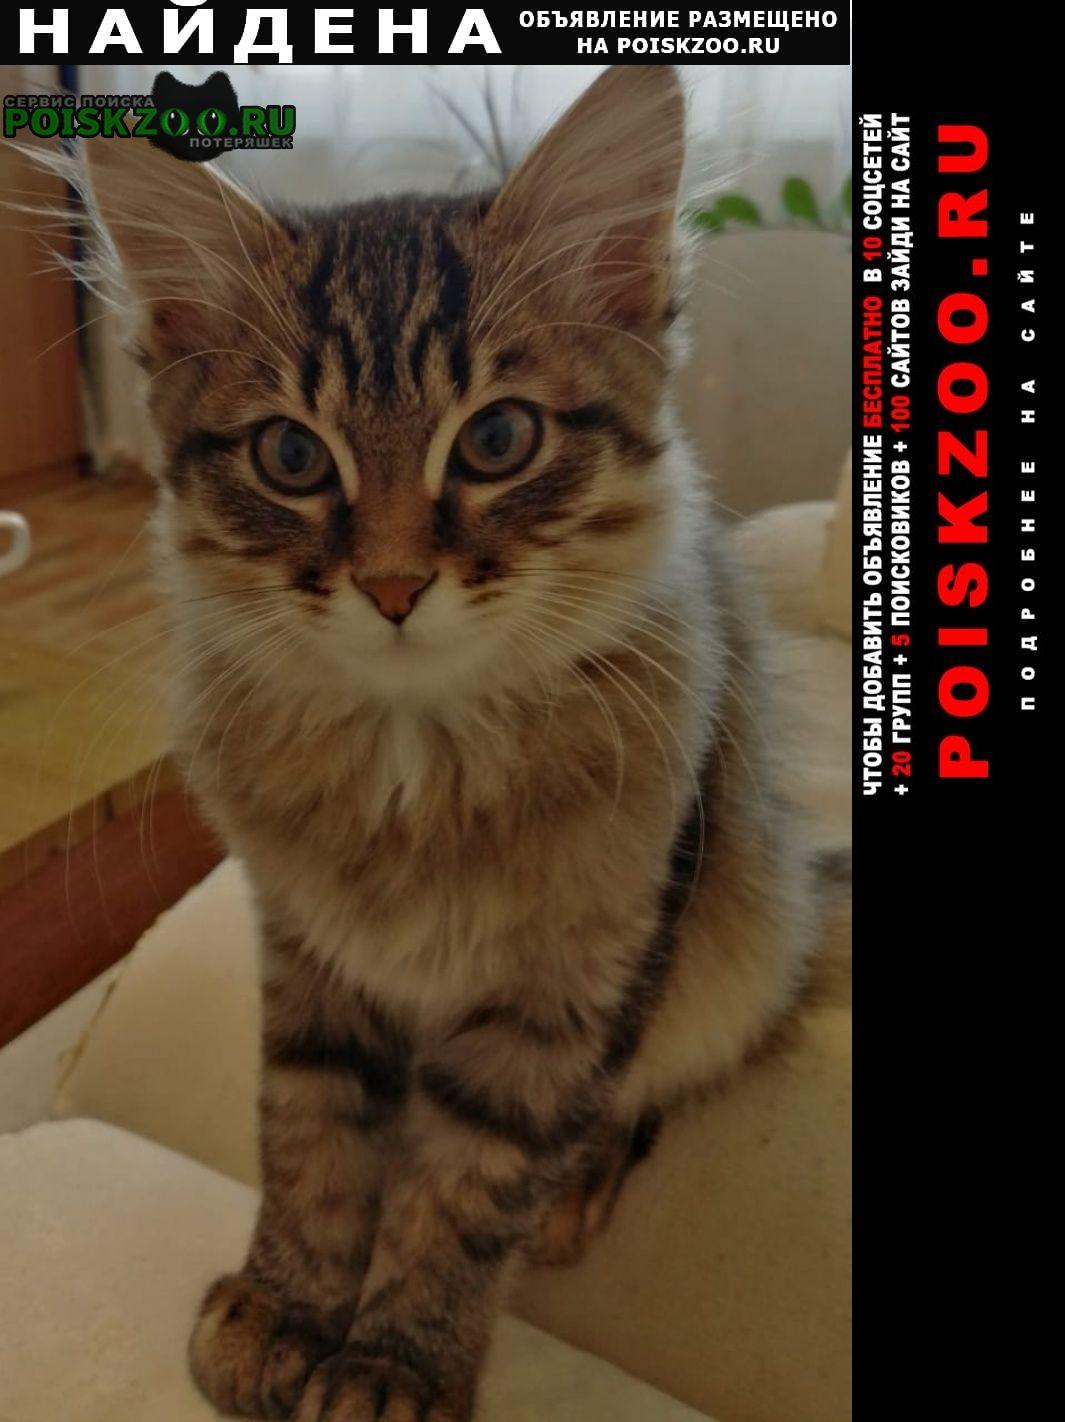 Найдена кошка Набережные Челны